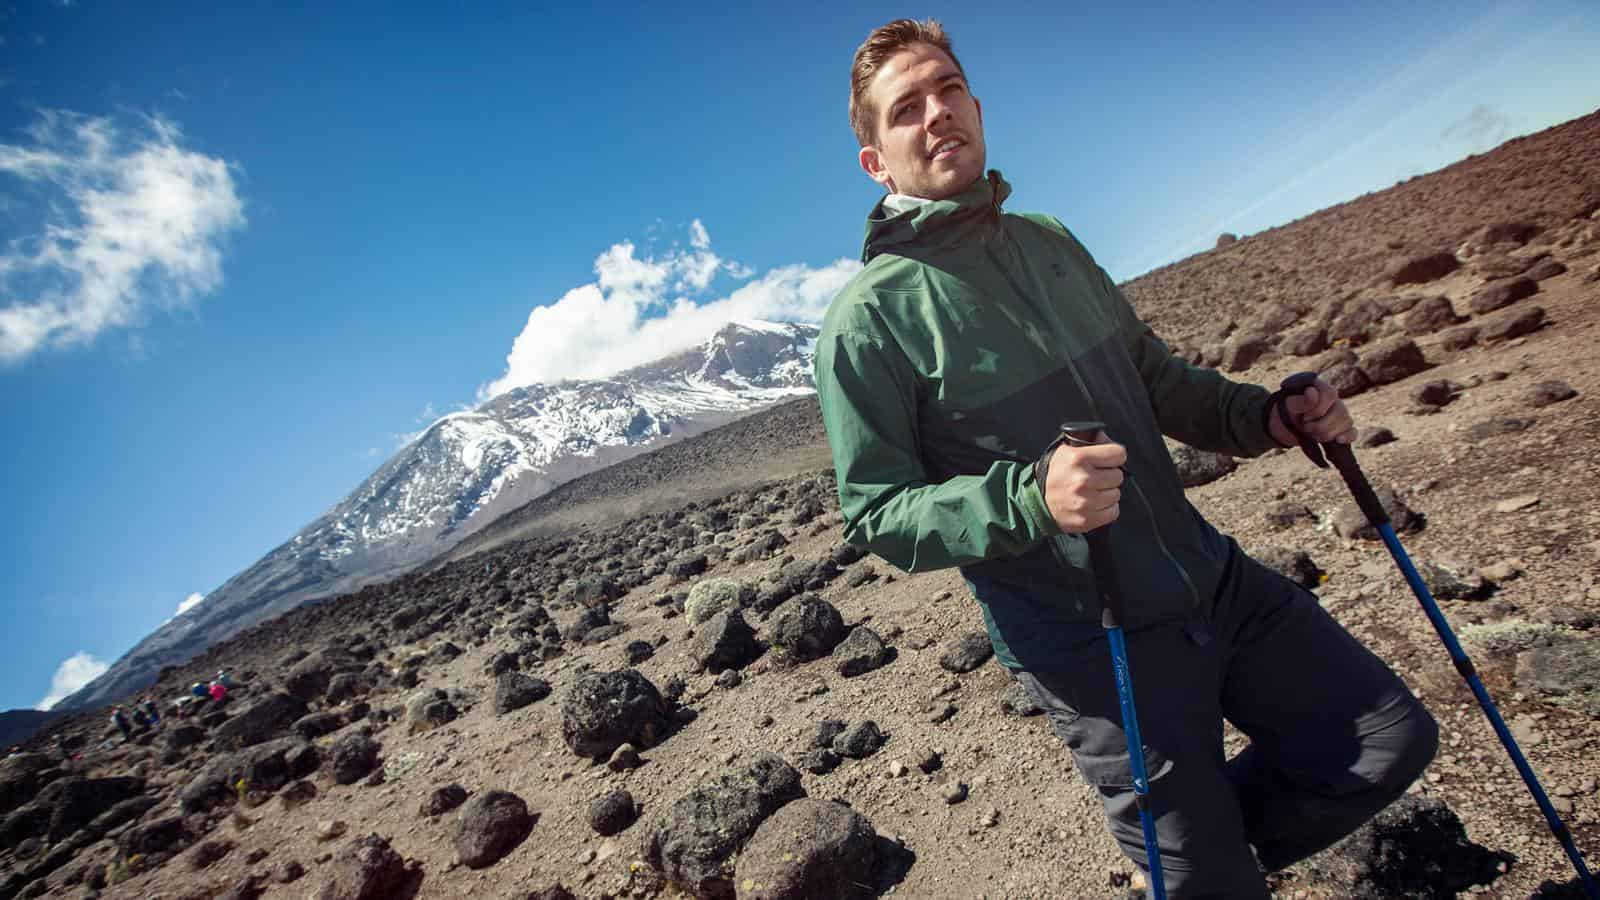 Pohod na kilimandžaro 1